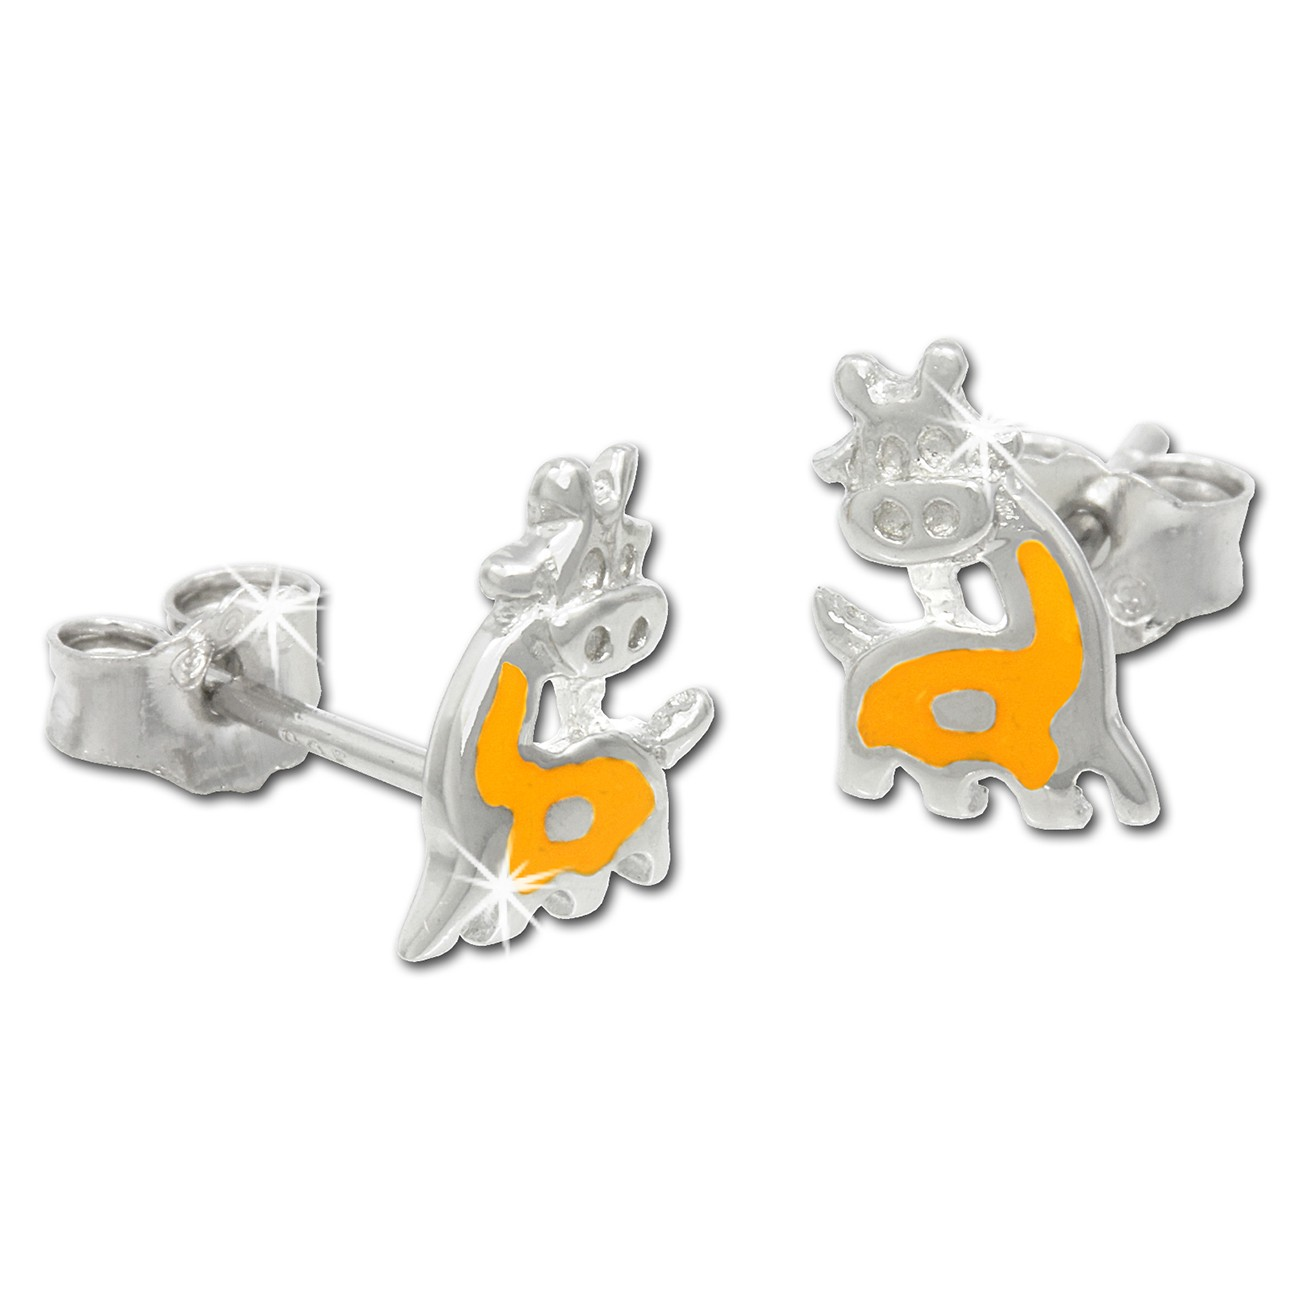 Kinder Ohrring Giraffe gelb Silber Ohrstecker Kinderschmuck TW SDO205Y